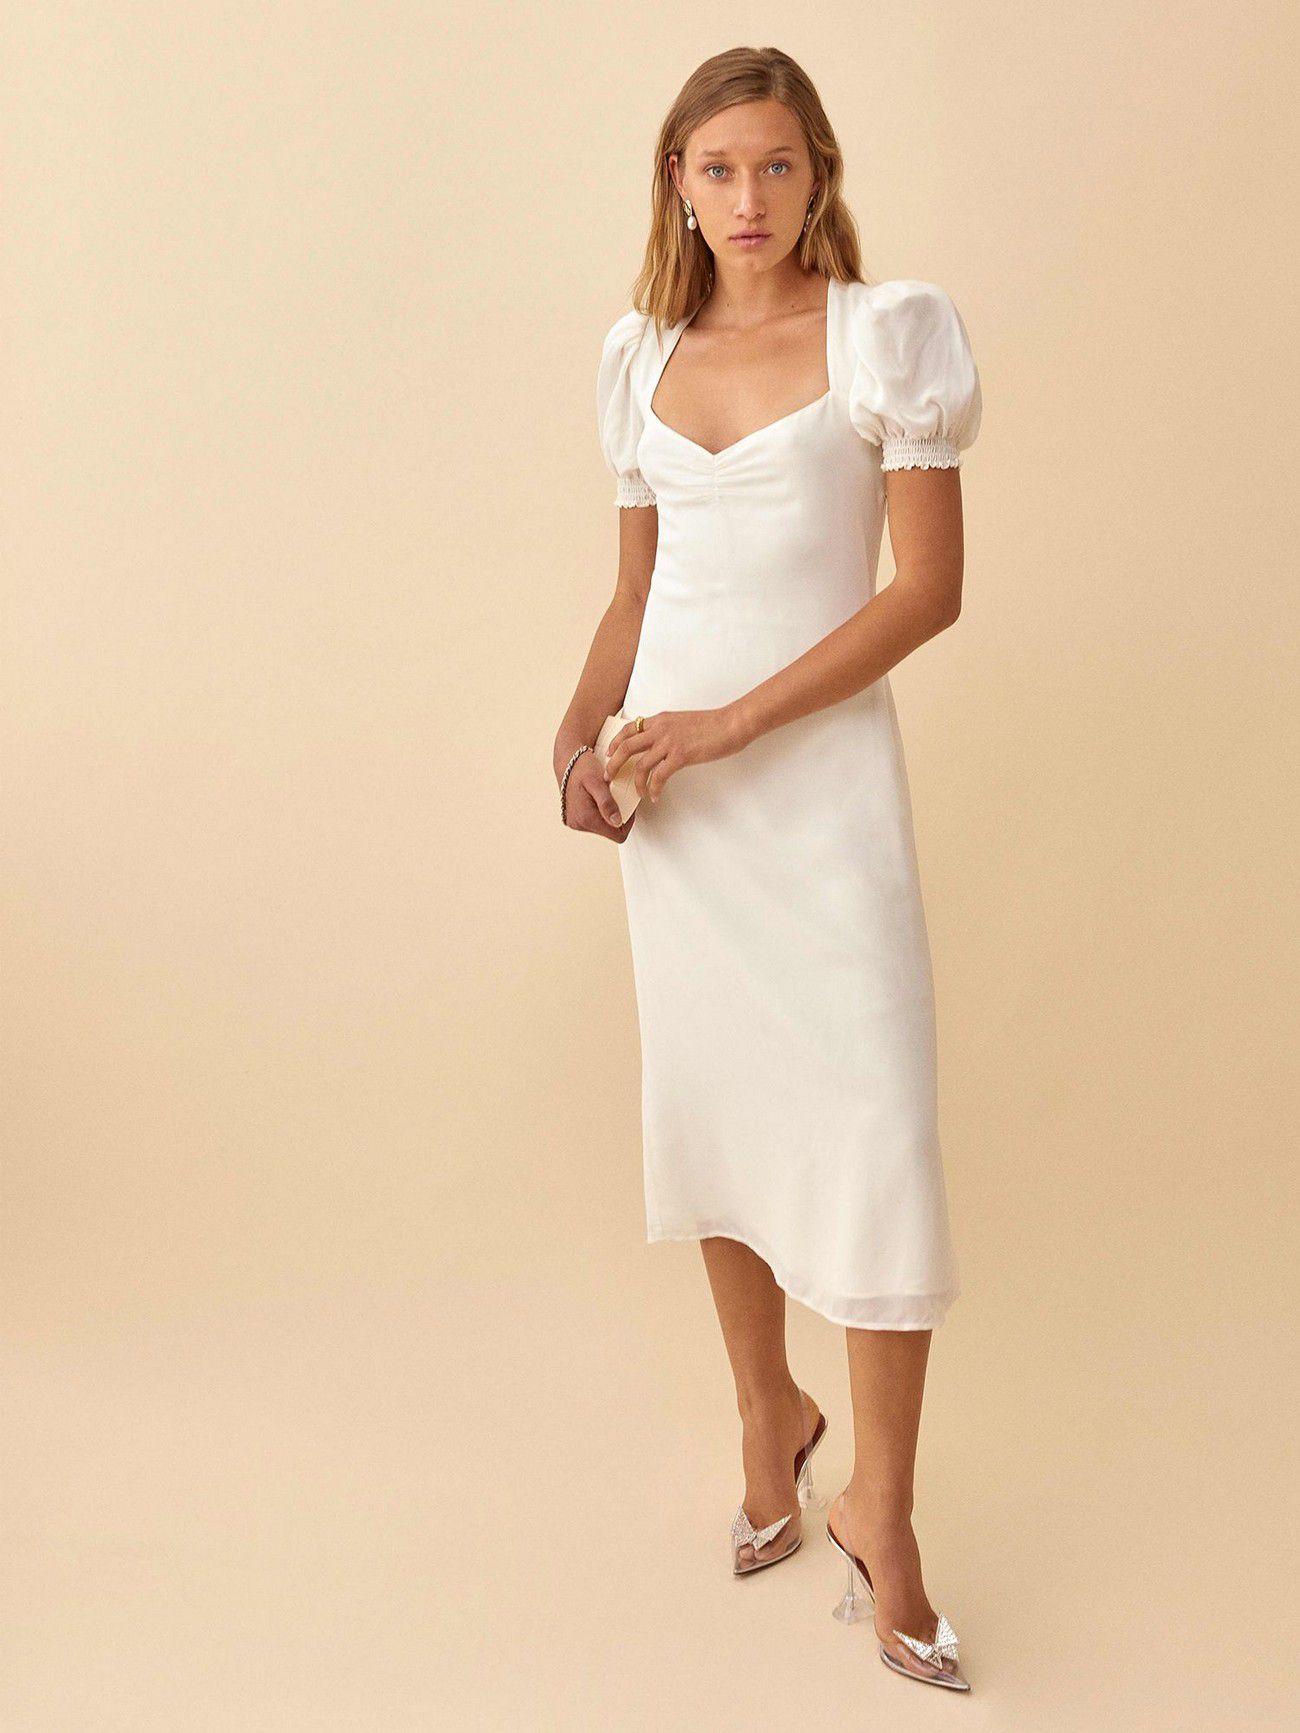 https://greenweddingshoes.com/wp-content/uploads/2020/09/luciana-reformation-short-wedding-dress.jpeg